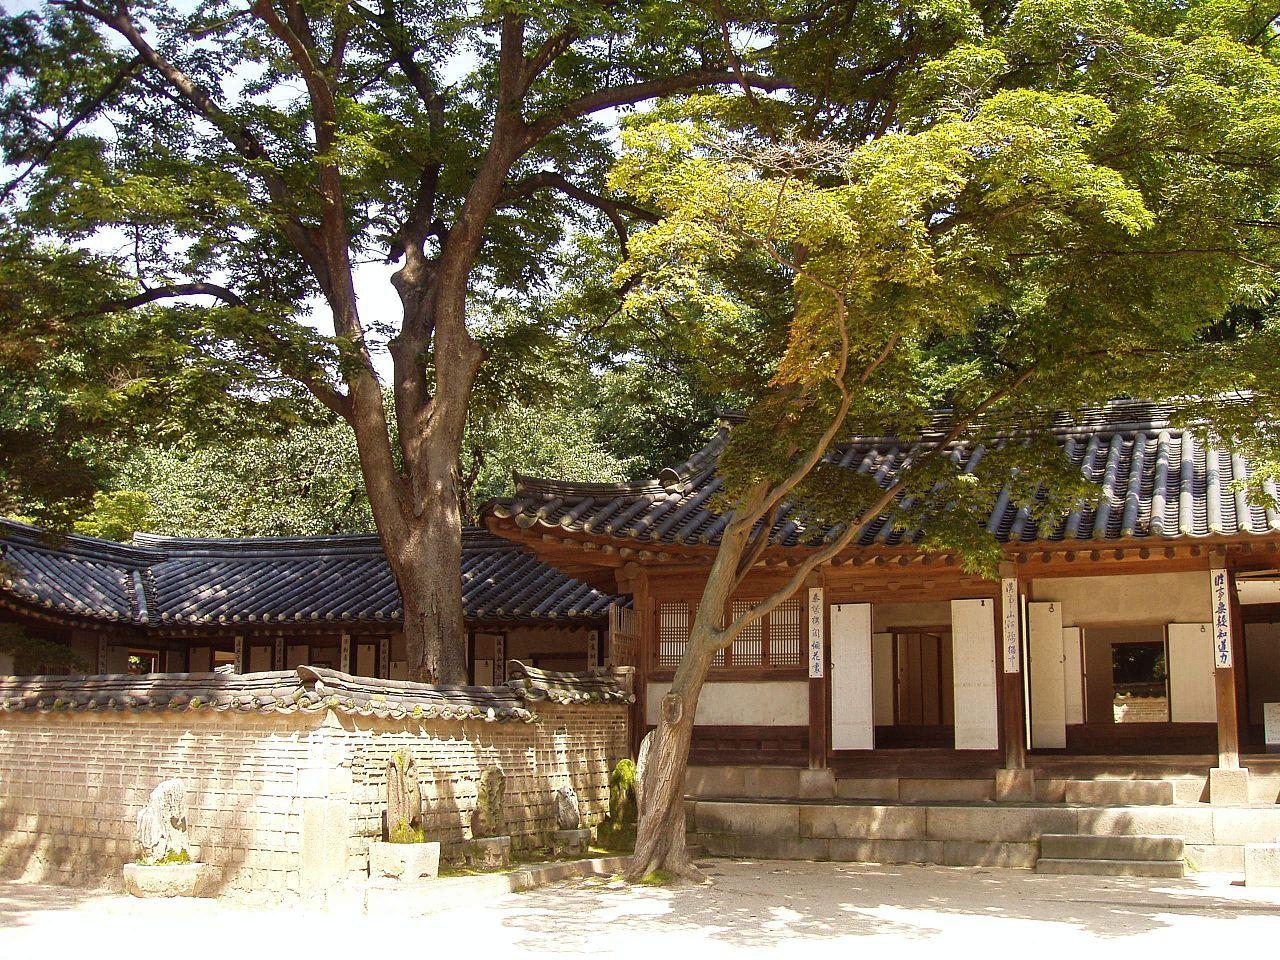 Yeongyeongdang, Changdeokgung - Seoul, Korea - 昌德宮 - 維基百科,自由的百科全書